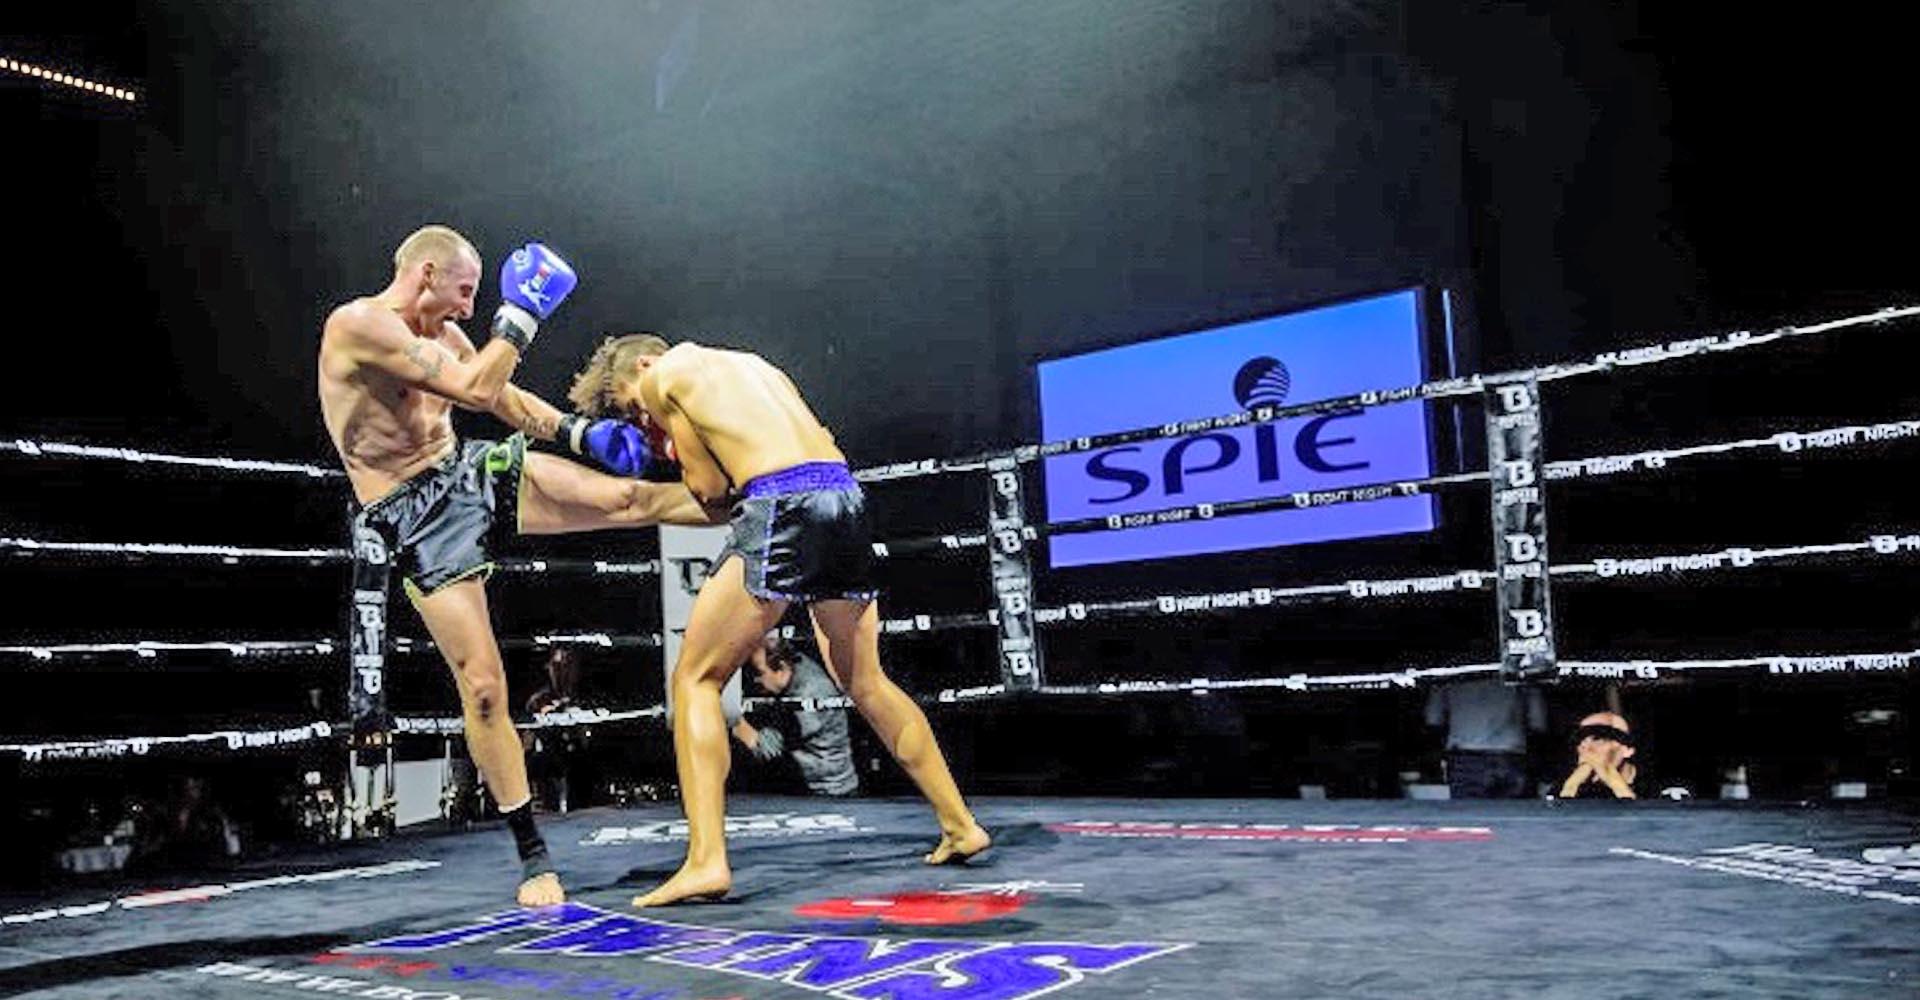 bronskigym-thaiboksclub-ieper-Thaiboxing